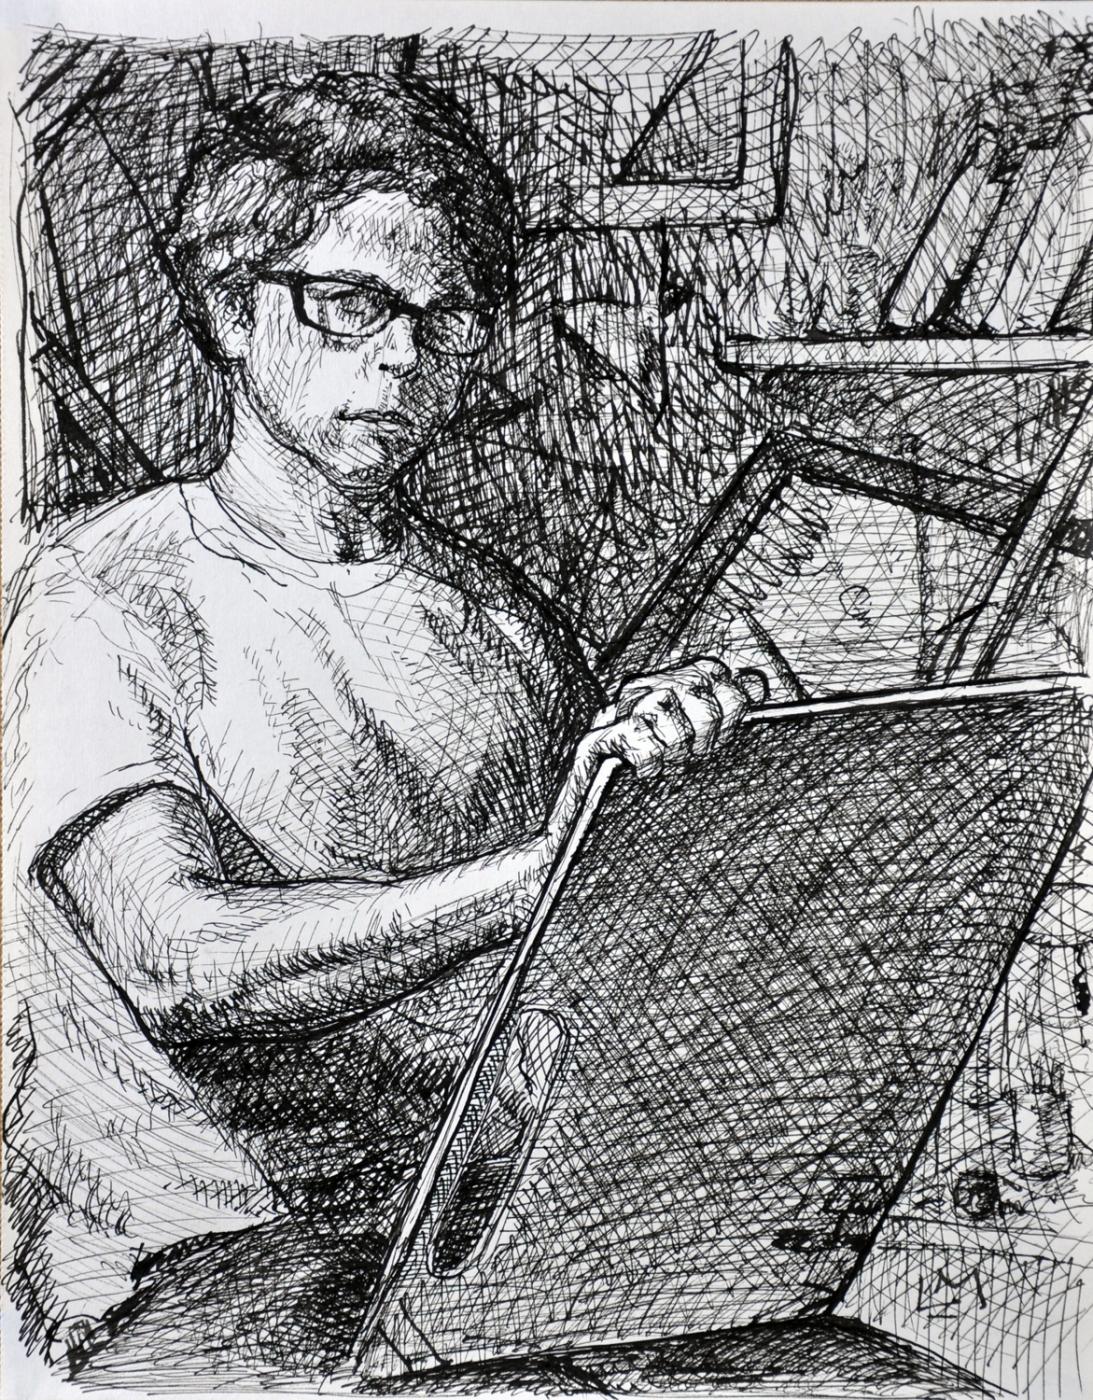 Self-Portrait in the Studio , ink, 2014